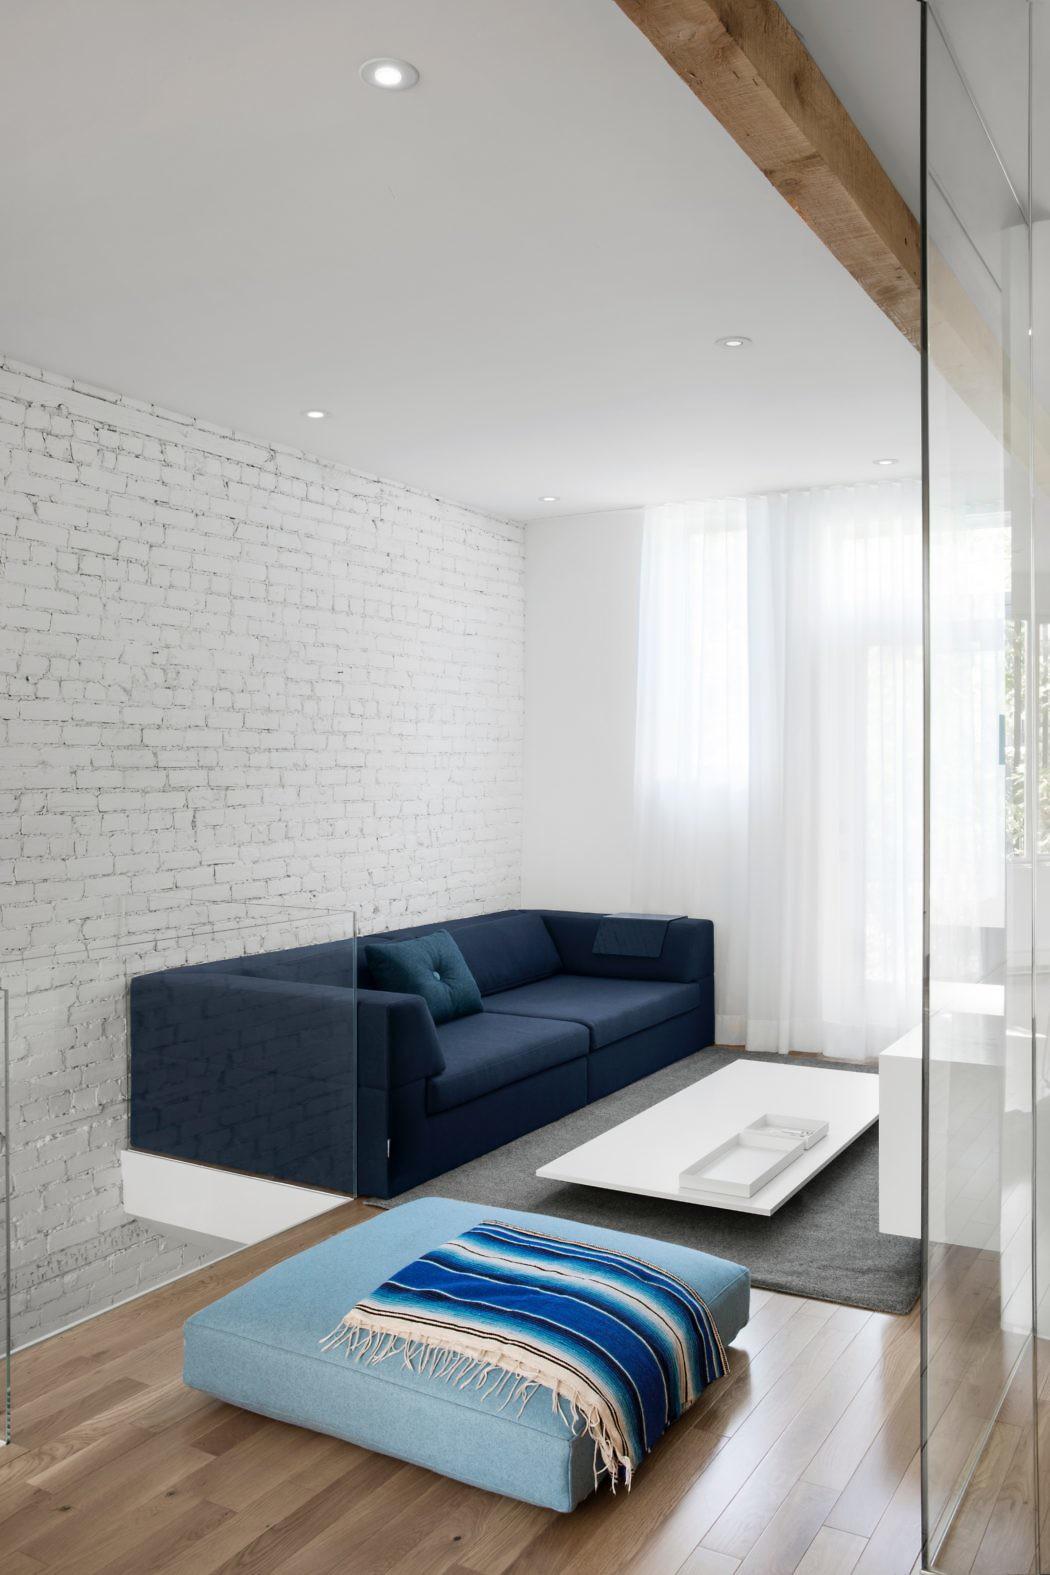 Triplex in Montreal by Anne Sophie Goneau